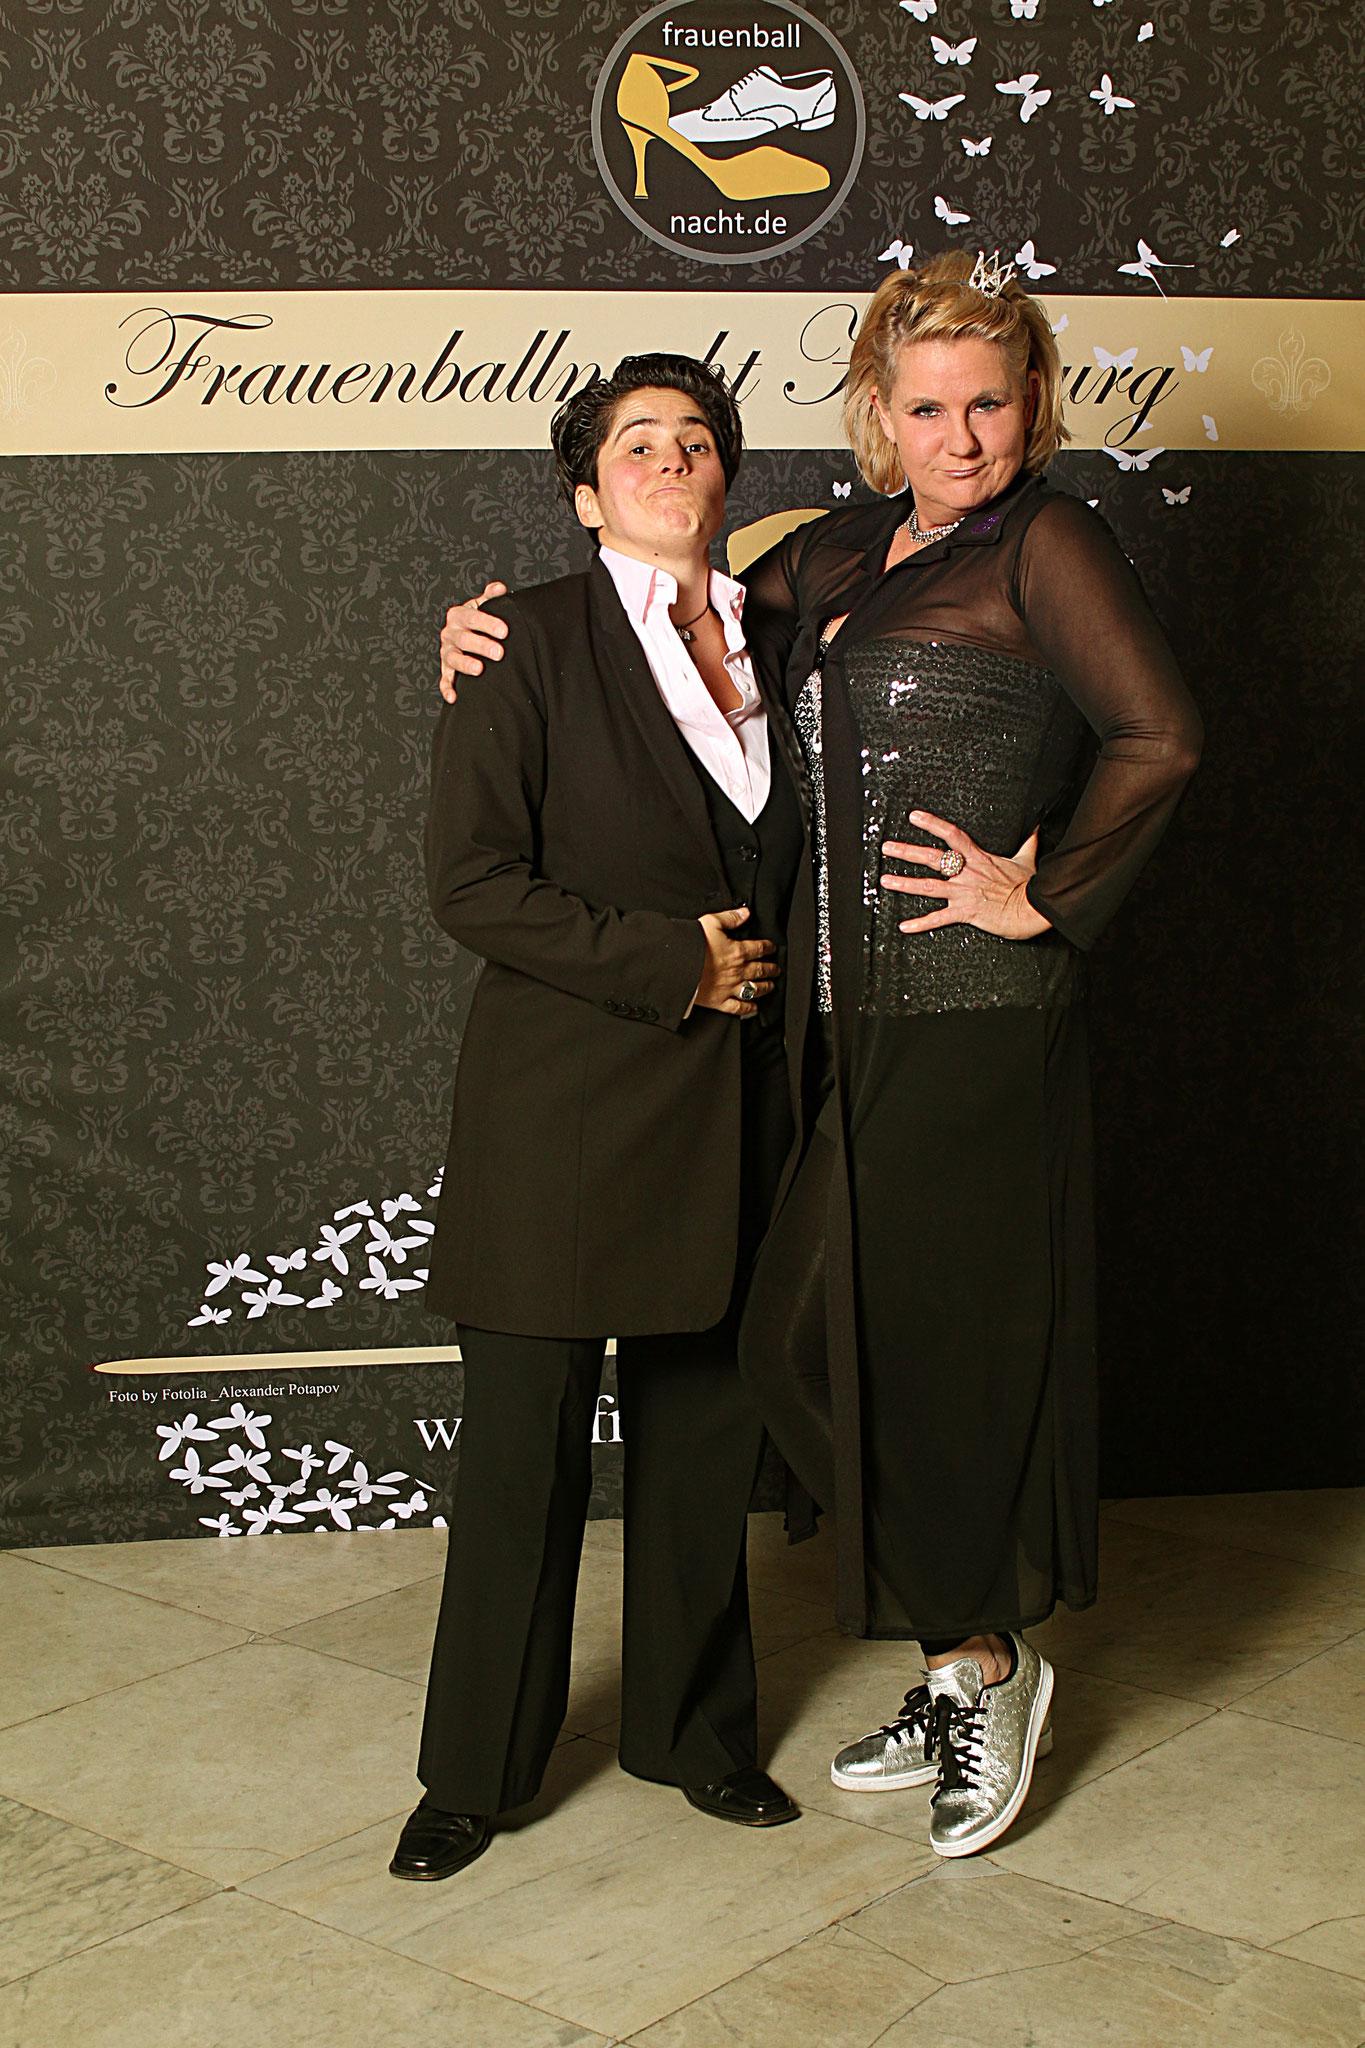 Denise & Glitterfee Tanja - mit uns werden Träume wahr! (pic by Oxana Kessler/Alexander Potapov – Fotolia (woman butterflies)